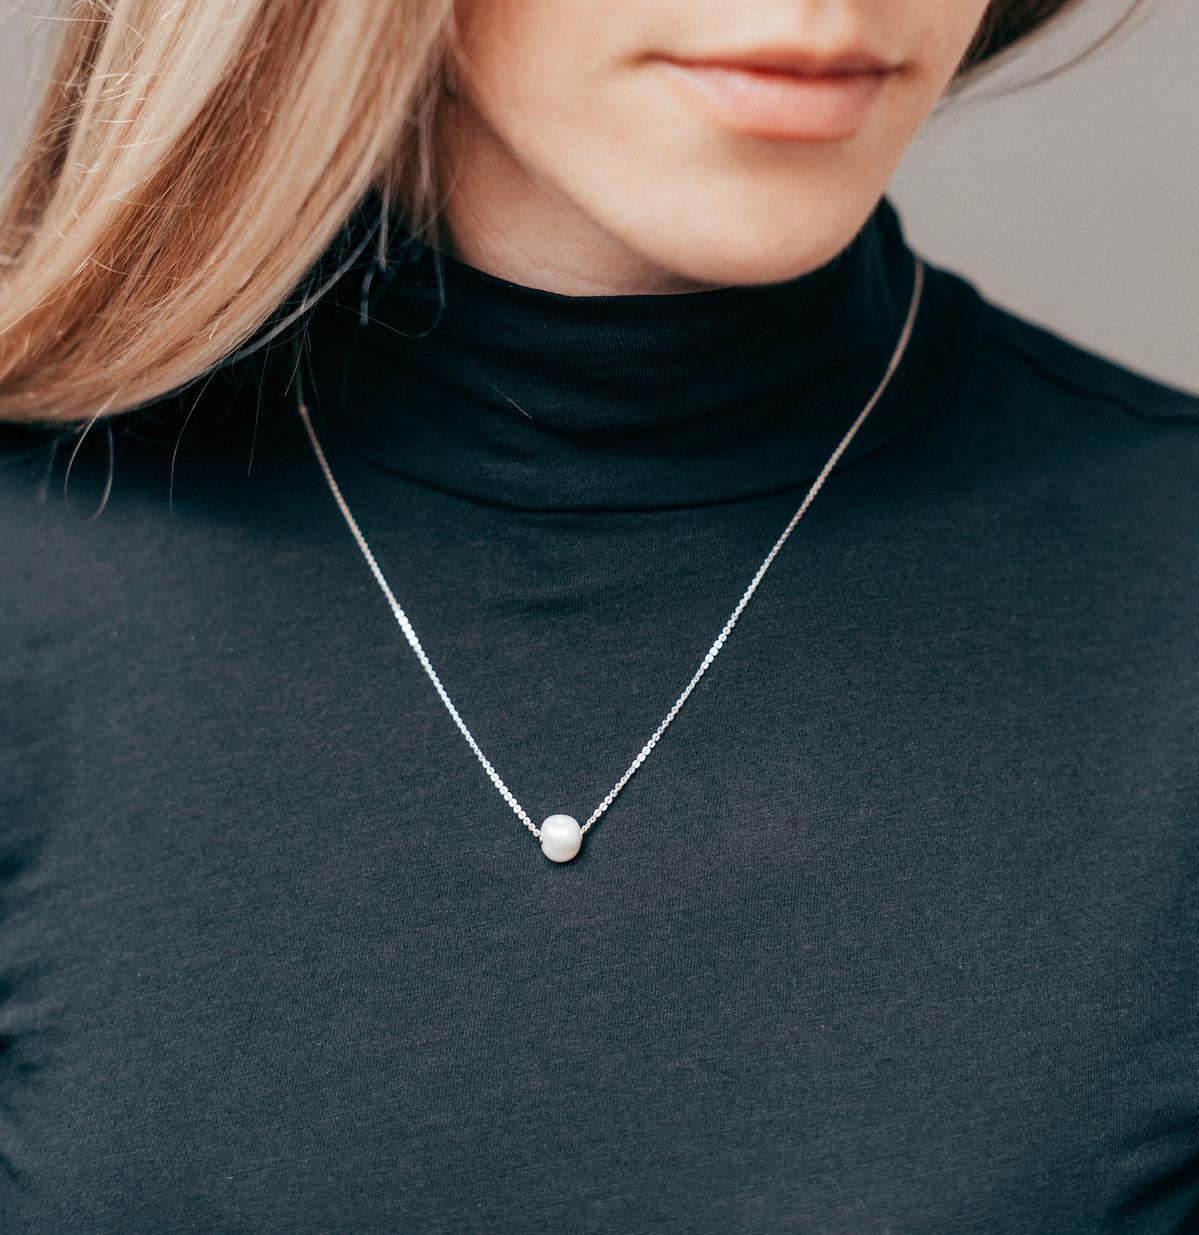 Mini Baroque Pearl Necklace in Sterling Silver